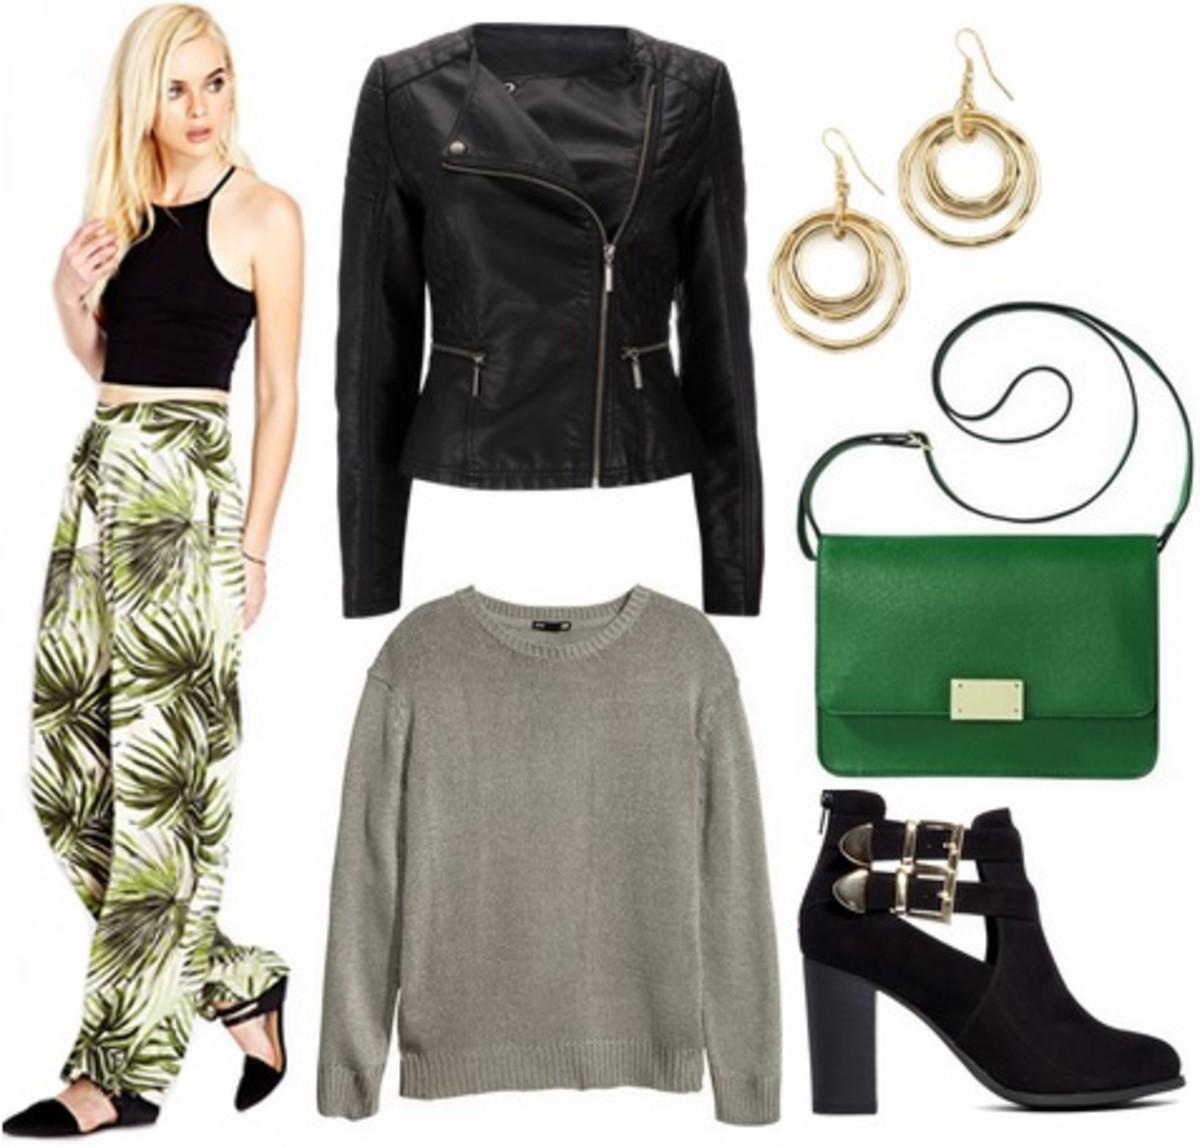 green-olive-wideleg-pants-print-grayl-sweater-black-shoe-booties-green-bag-earrings-black-jacket-moto-fall-winter-lunch.jpg